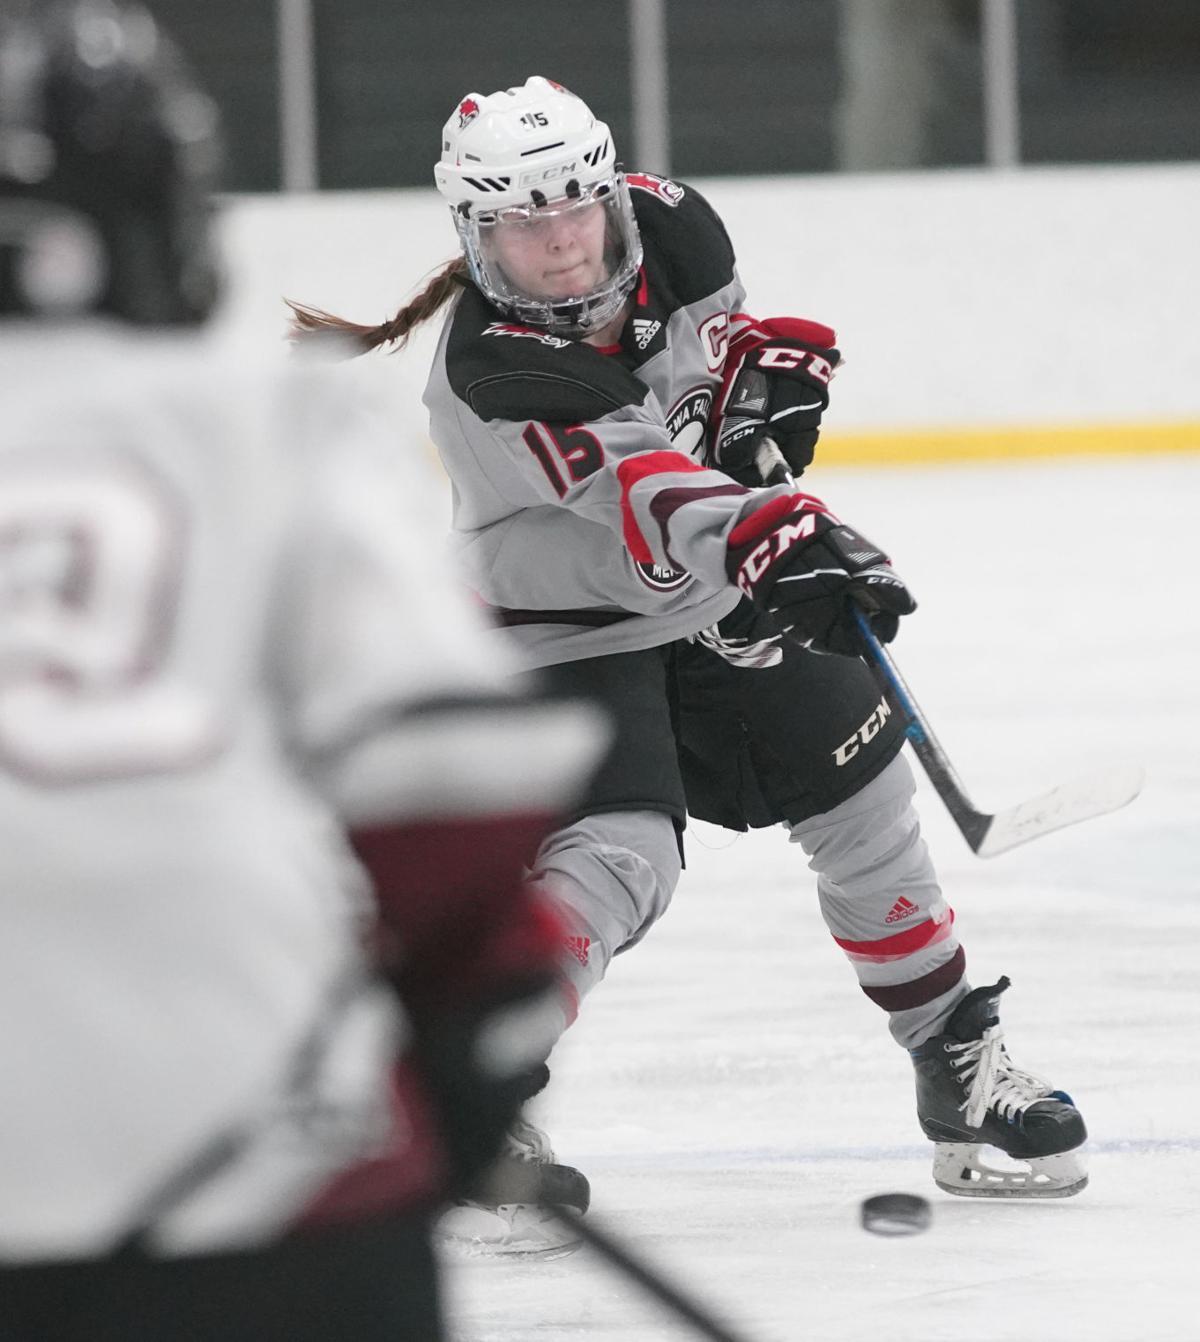 Chippewa/Falls Menomonie at Central Wisconsin hockey